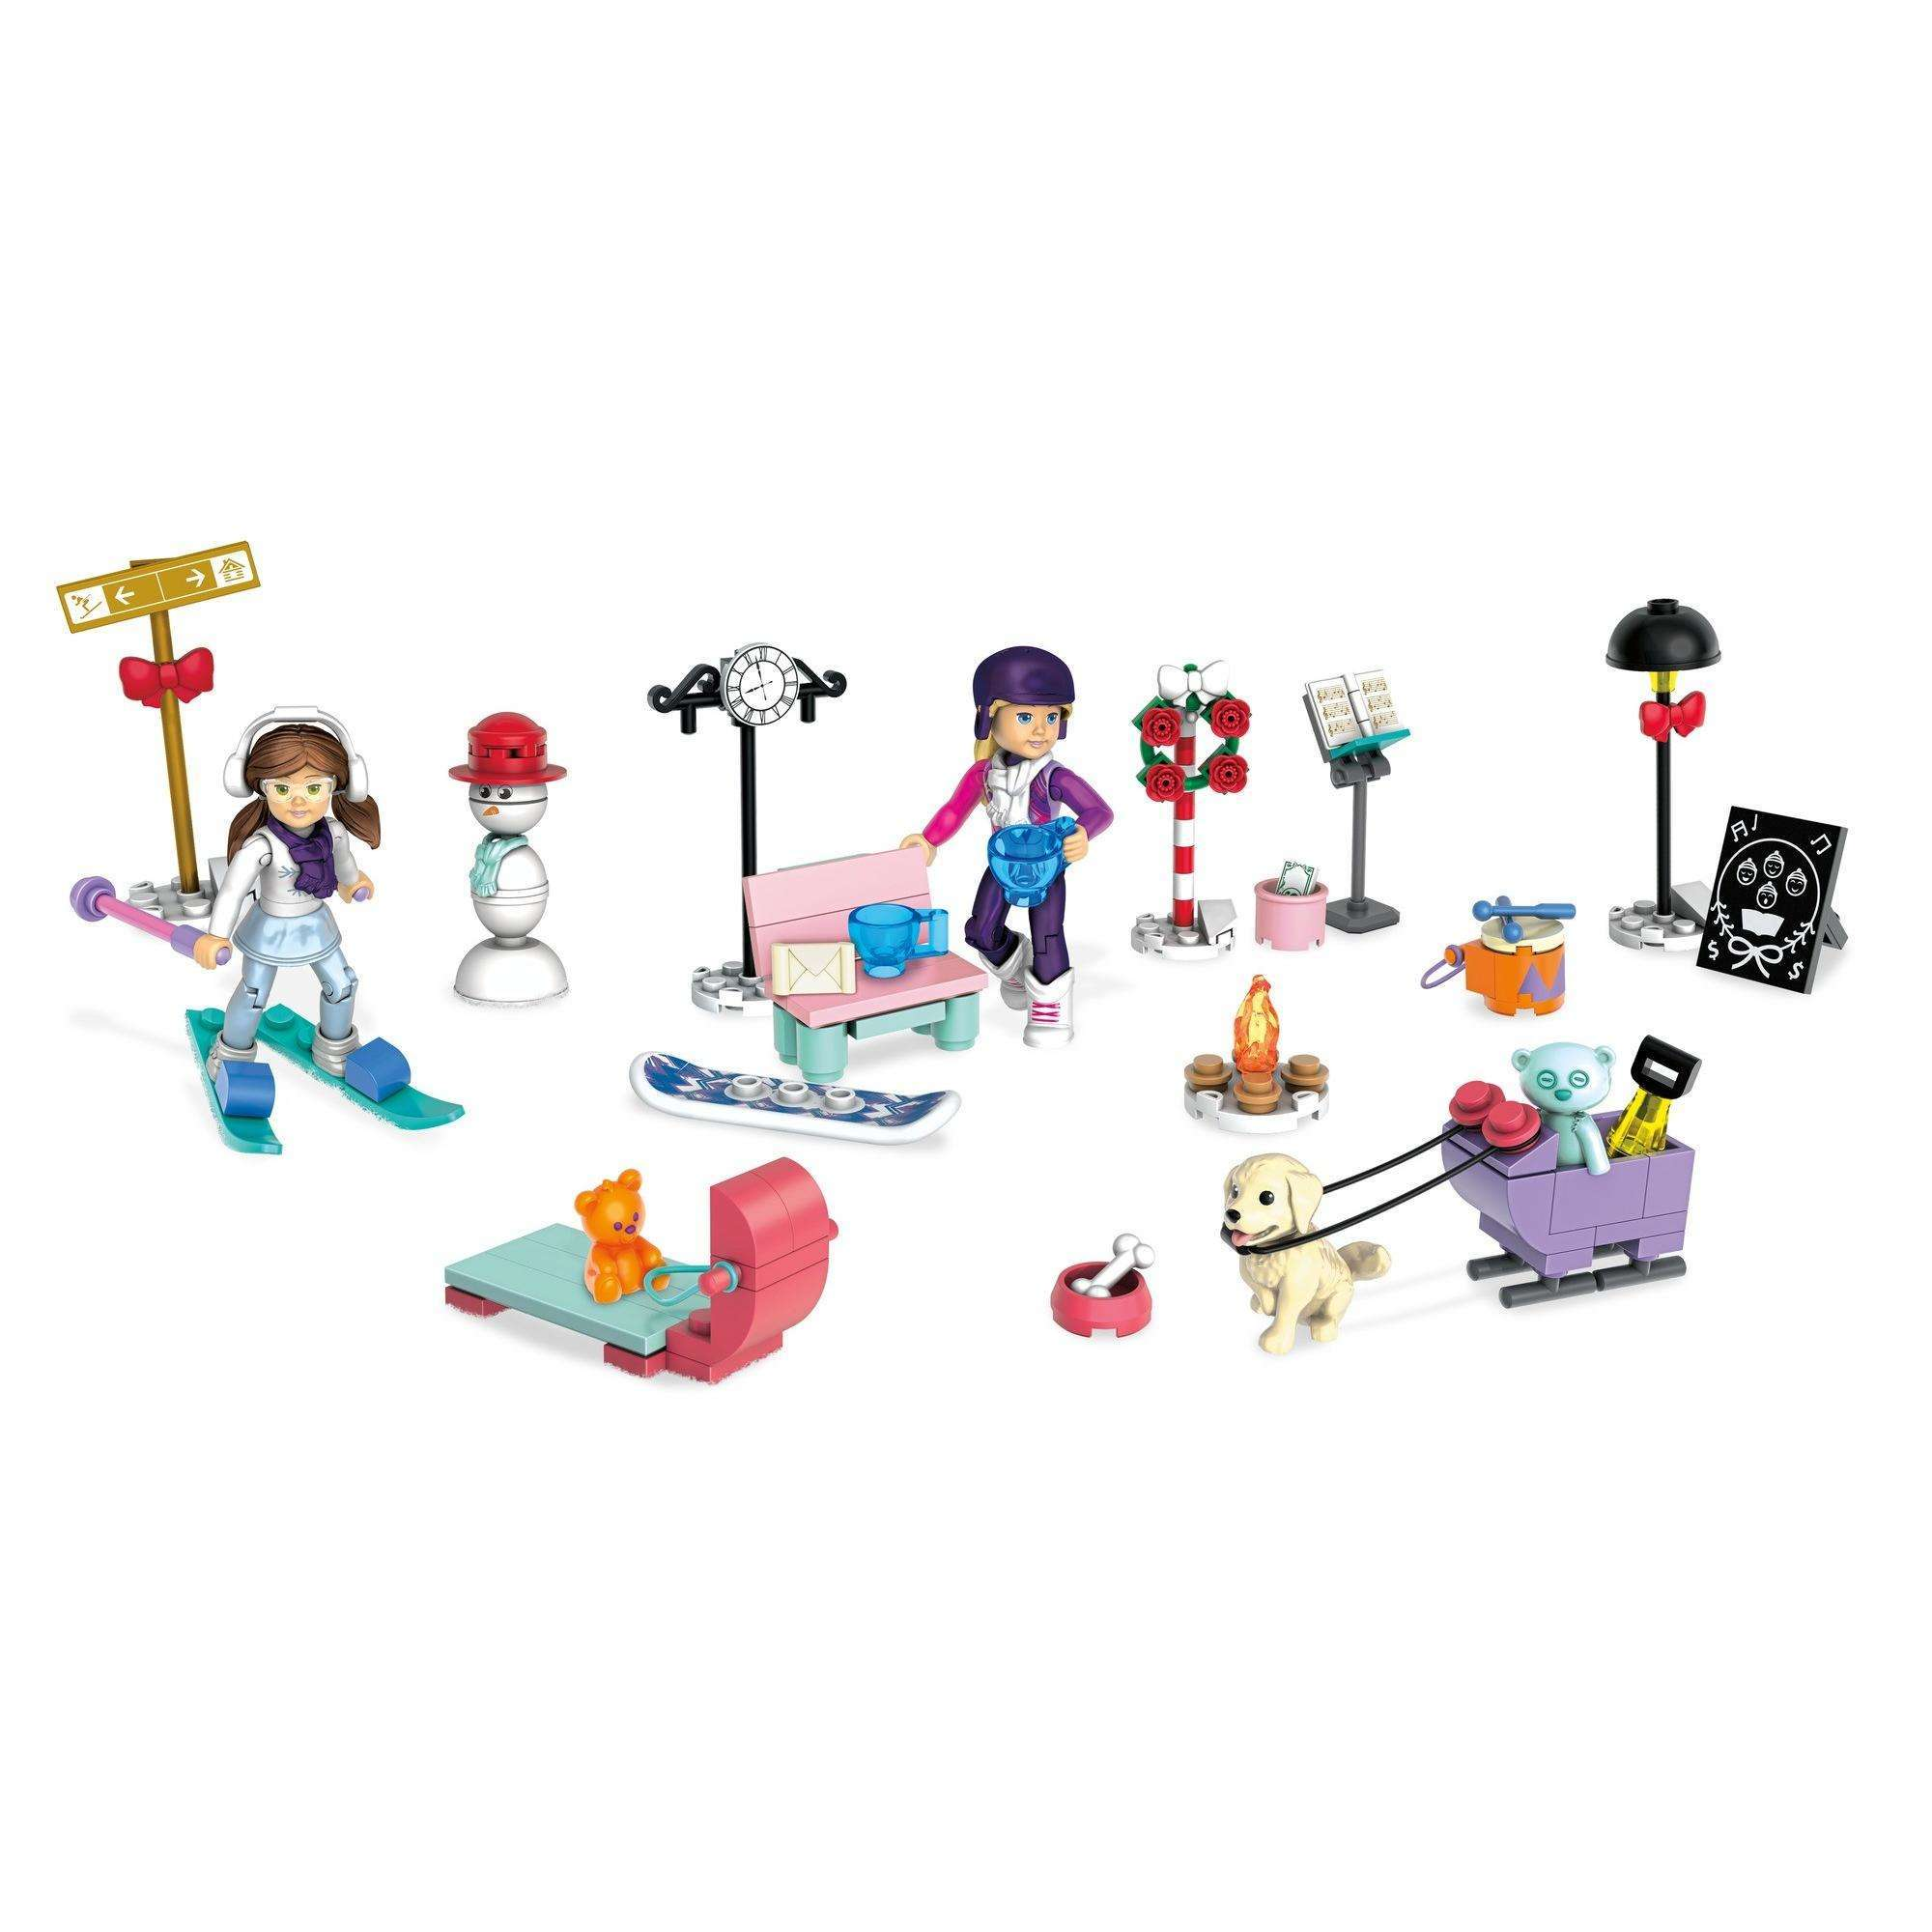 Mega Construx American Girl Advent Calendar by Mattel